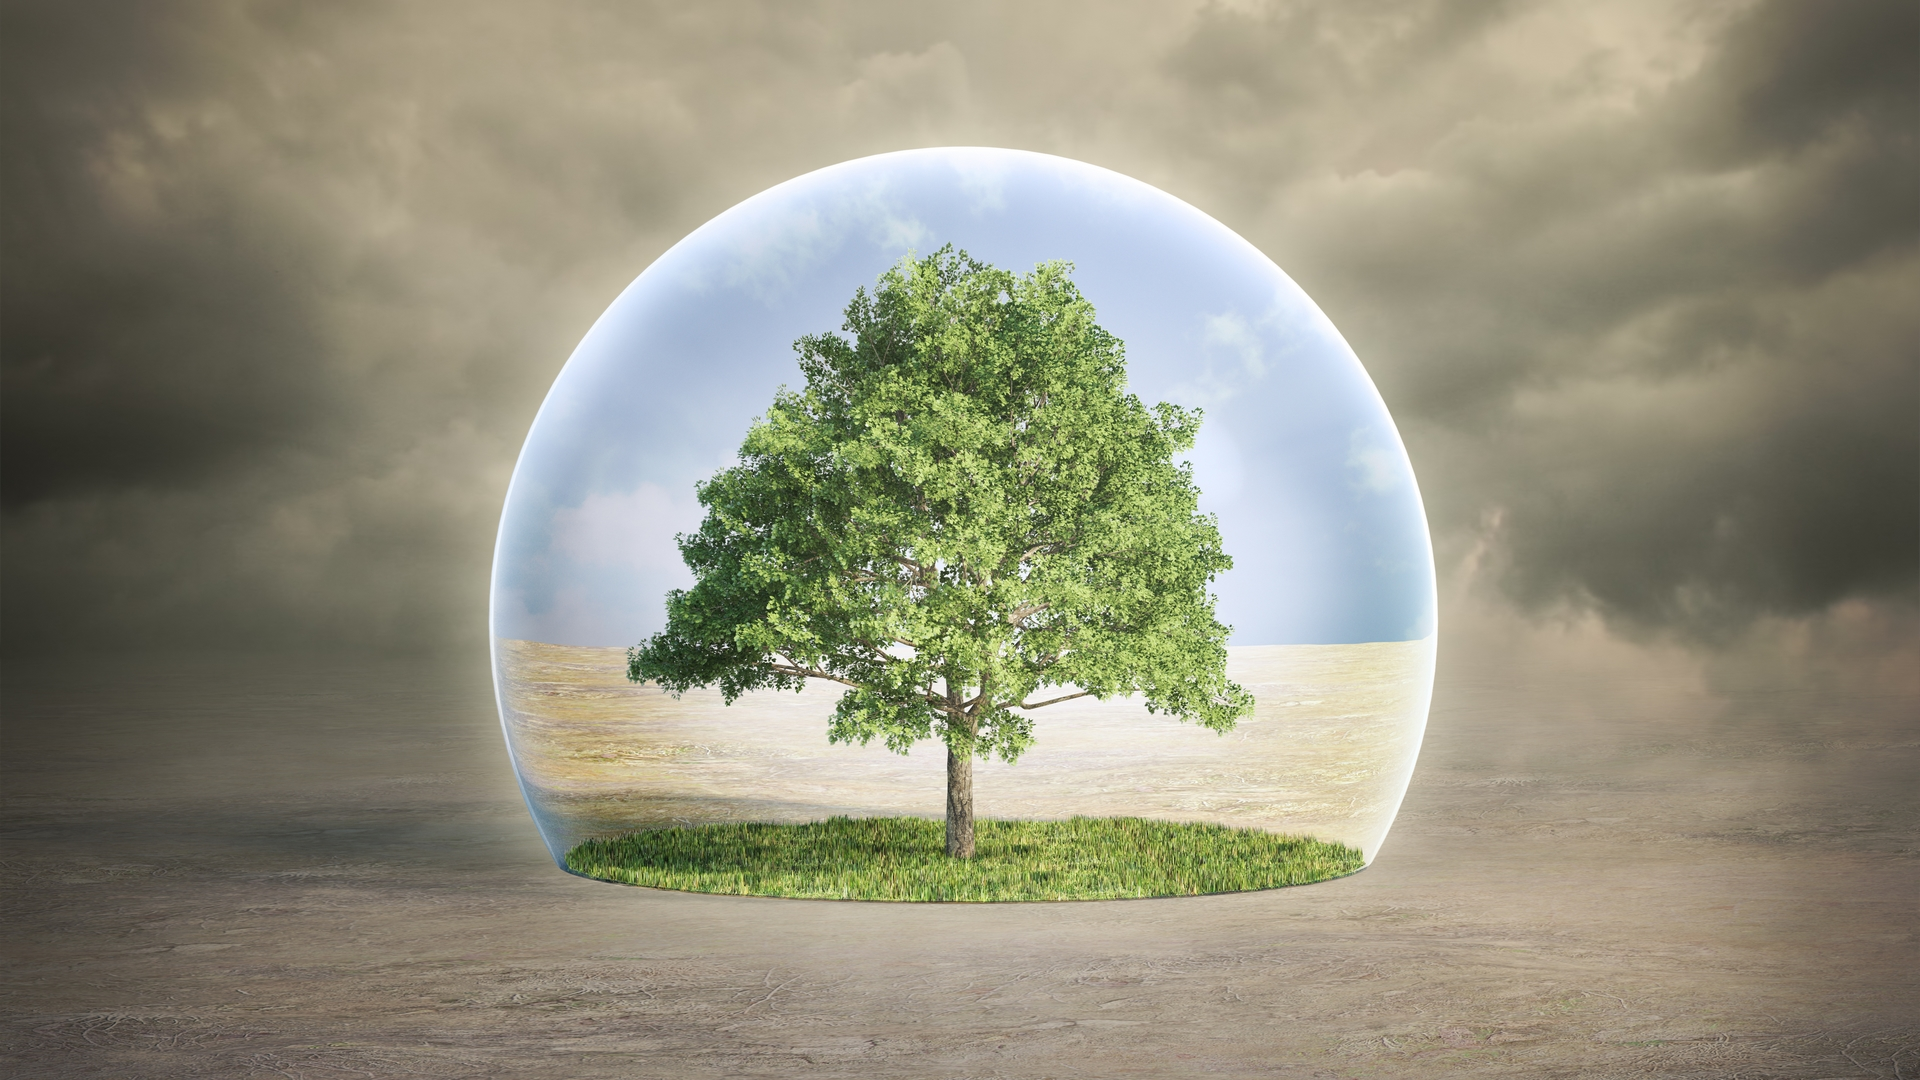 theory georgiou environmentally aware - HD1920×1080